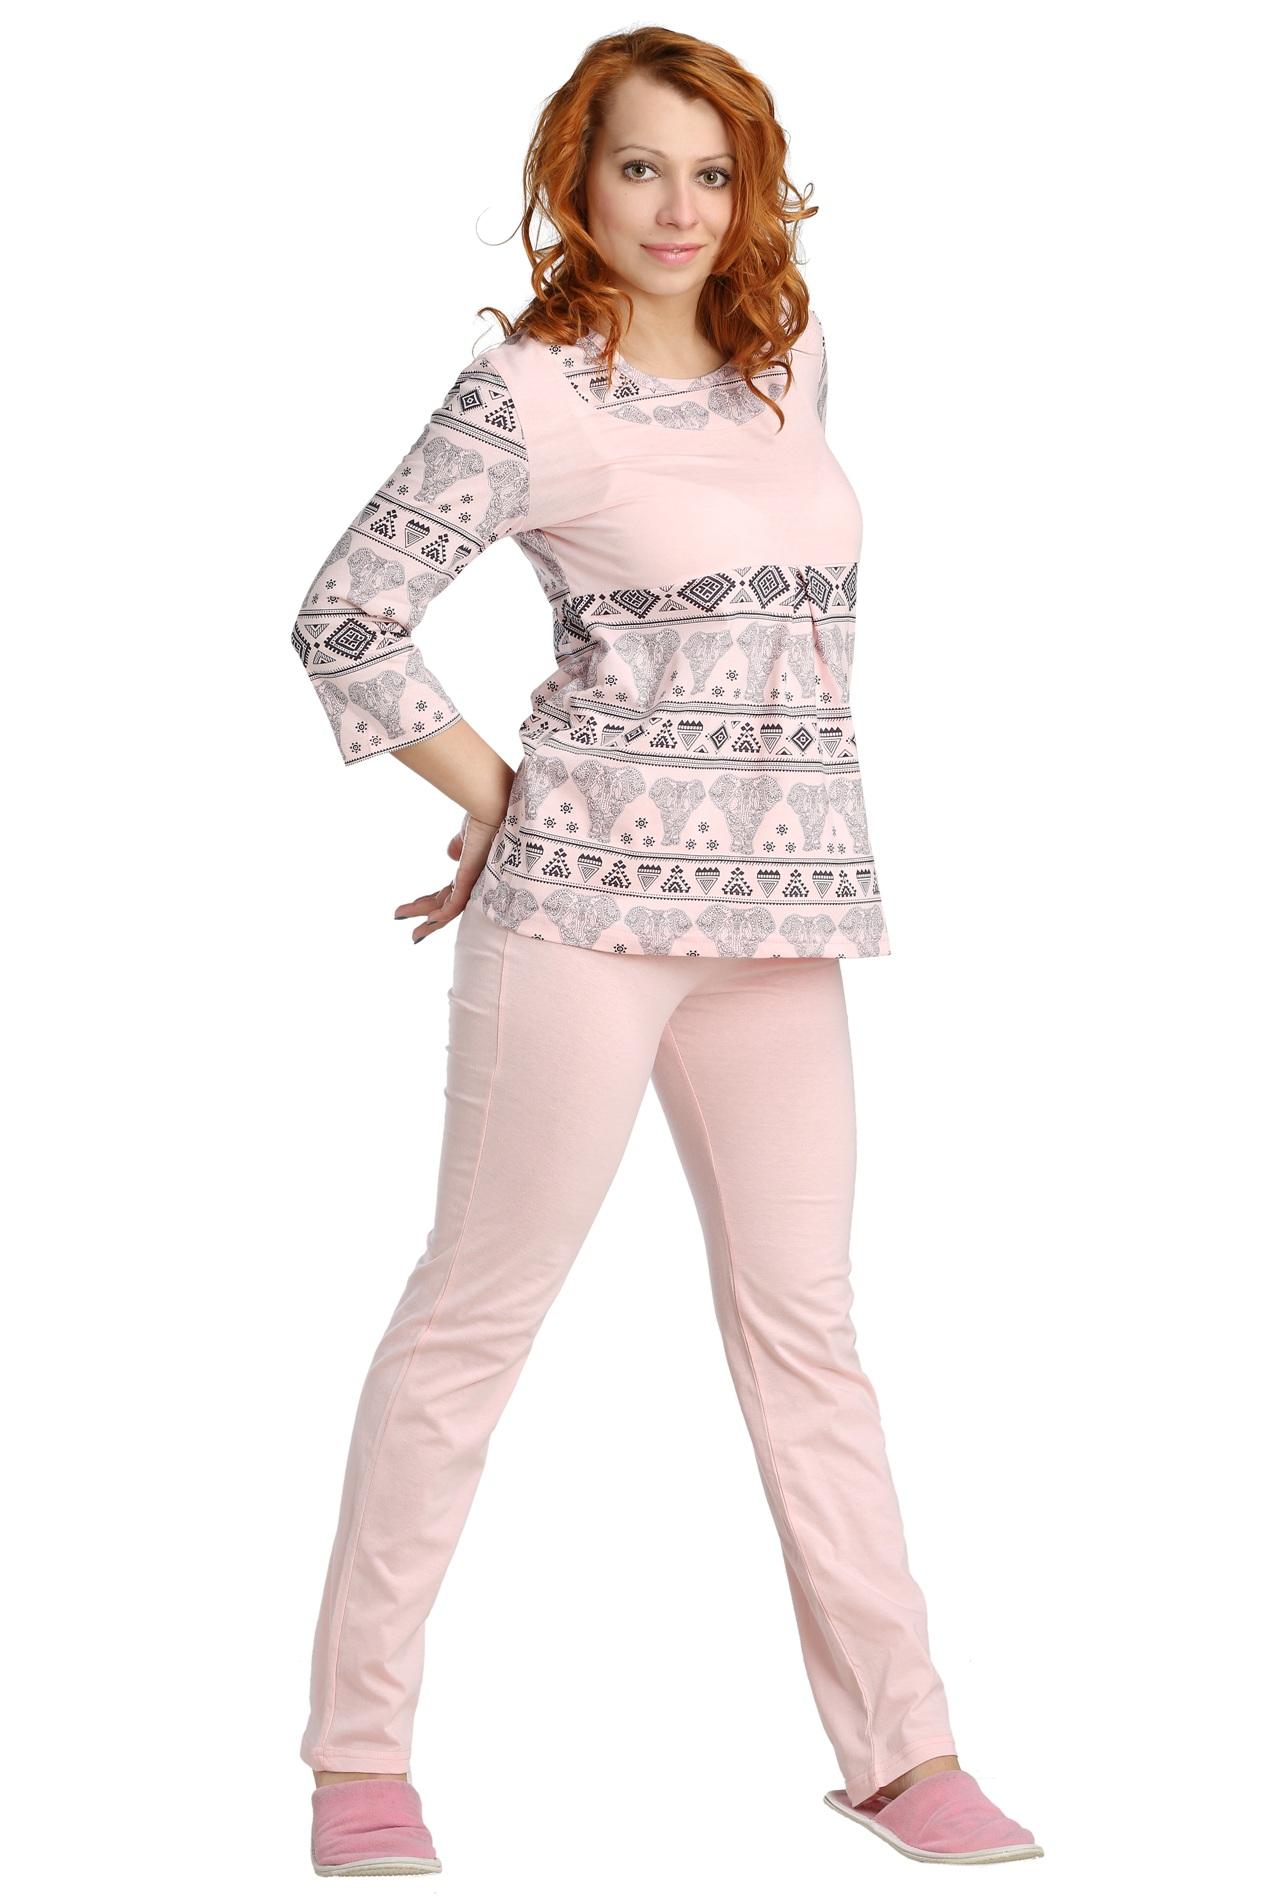 Жен. пижама арт. 16-0087 Розовый р. 44 пижама жен mia cara майка шорты botanical aw15 ubl lst 264 р 42 44 1119503